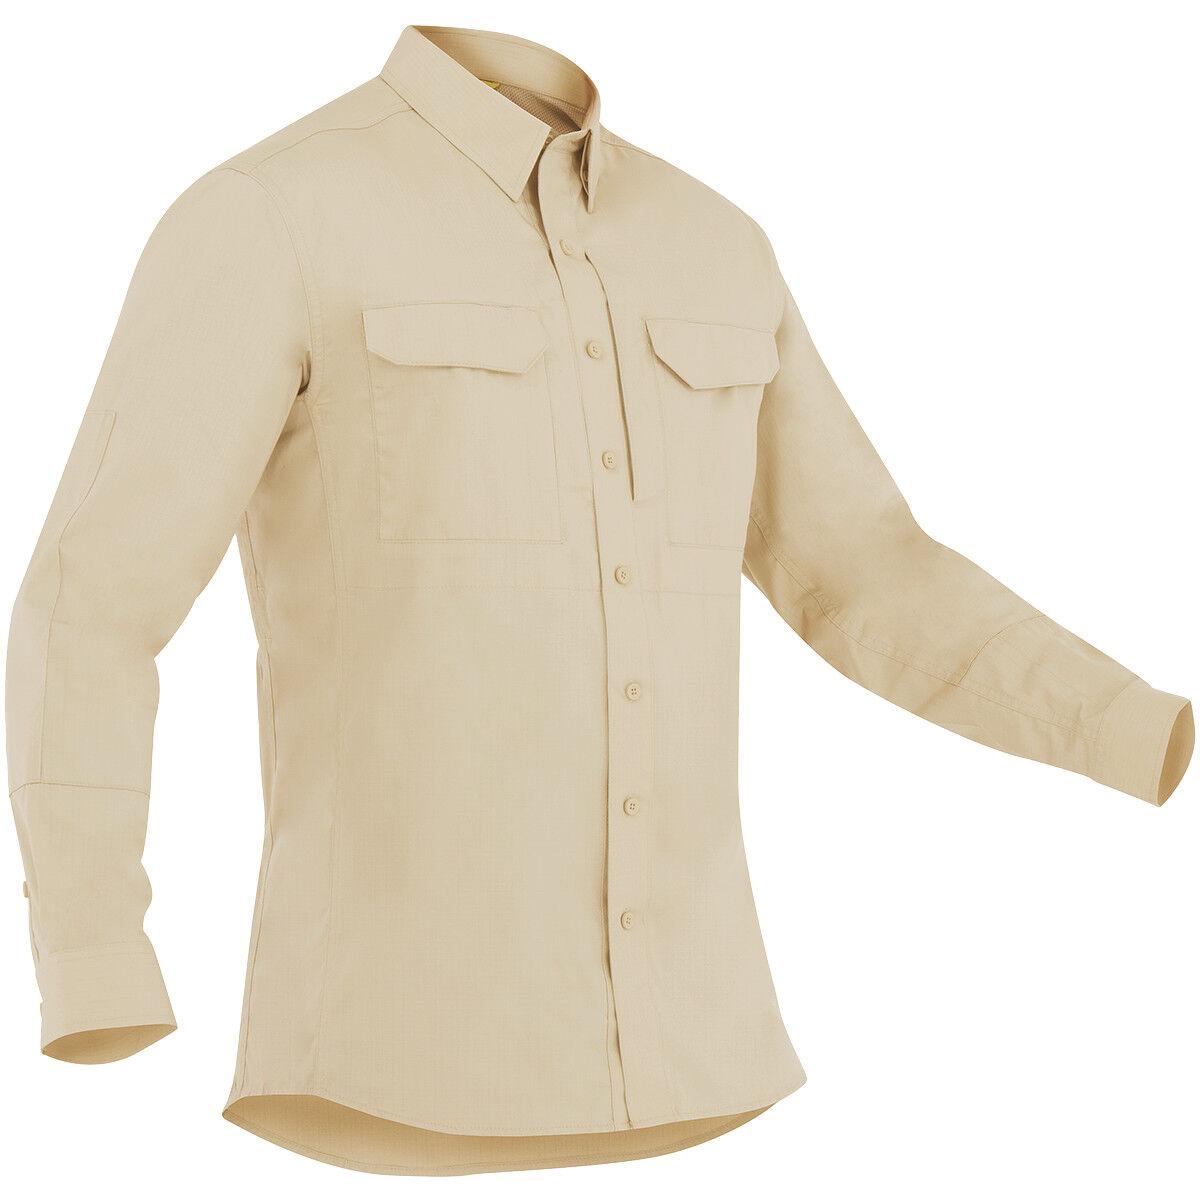 First Tactical Mens Specialist Long Sleeve Tactical Shirt Military Uniform Khaki